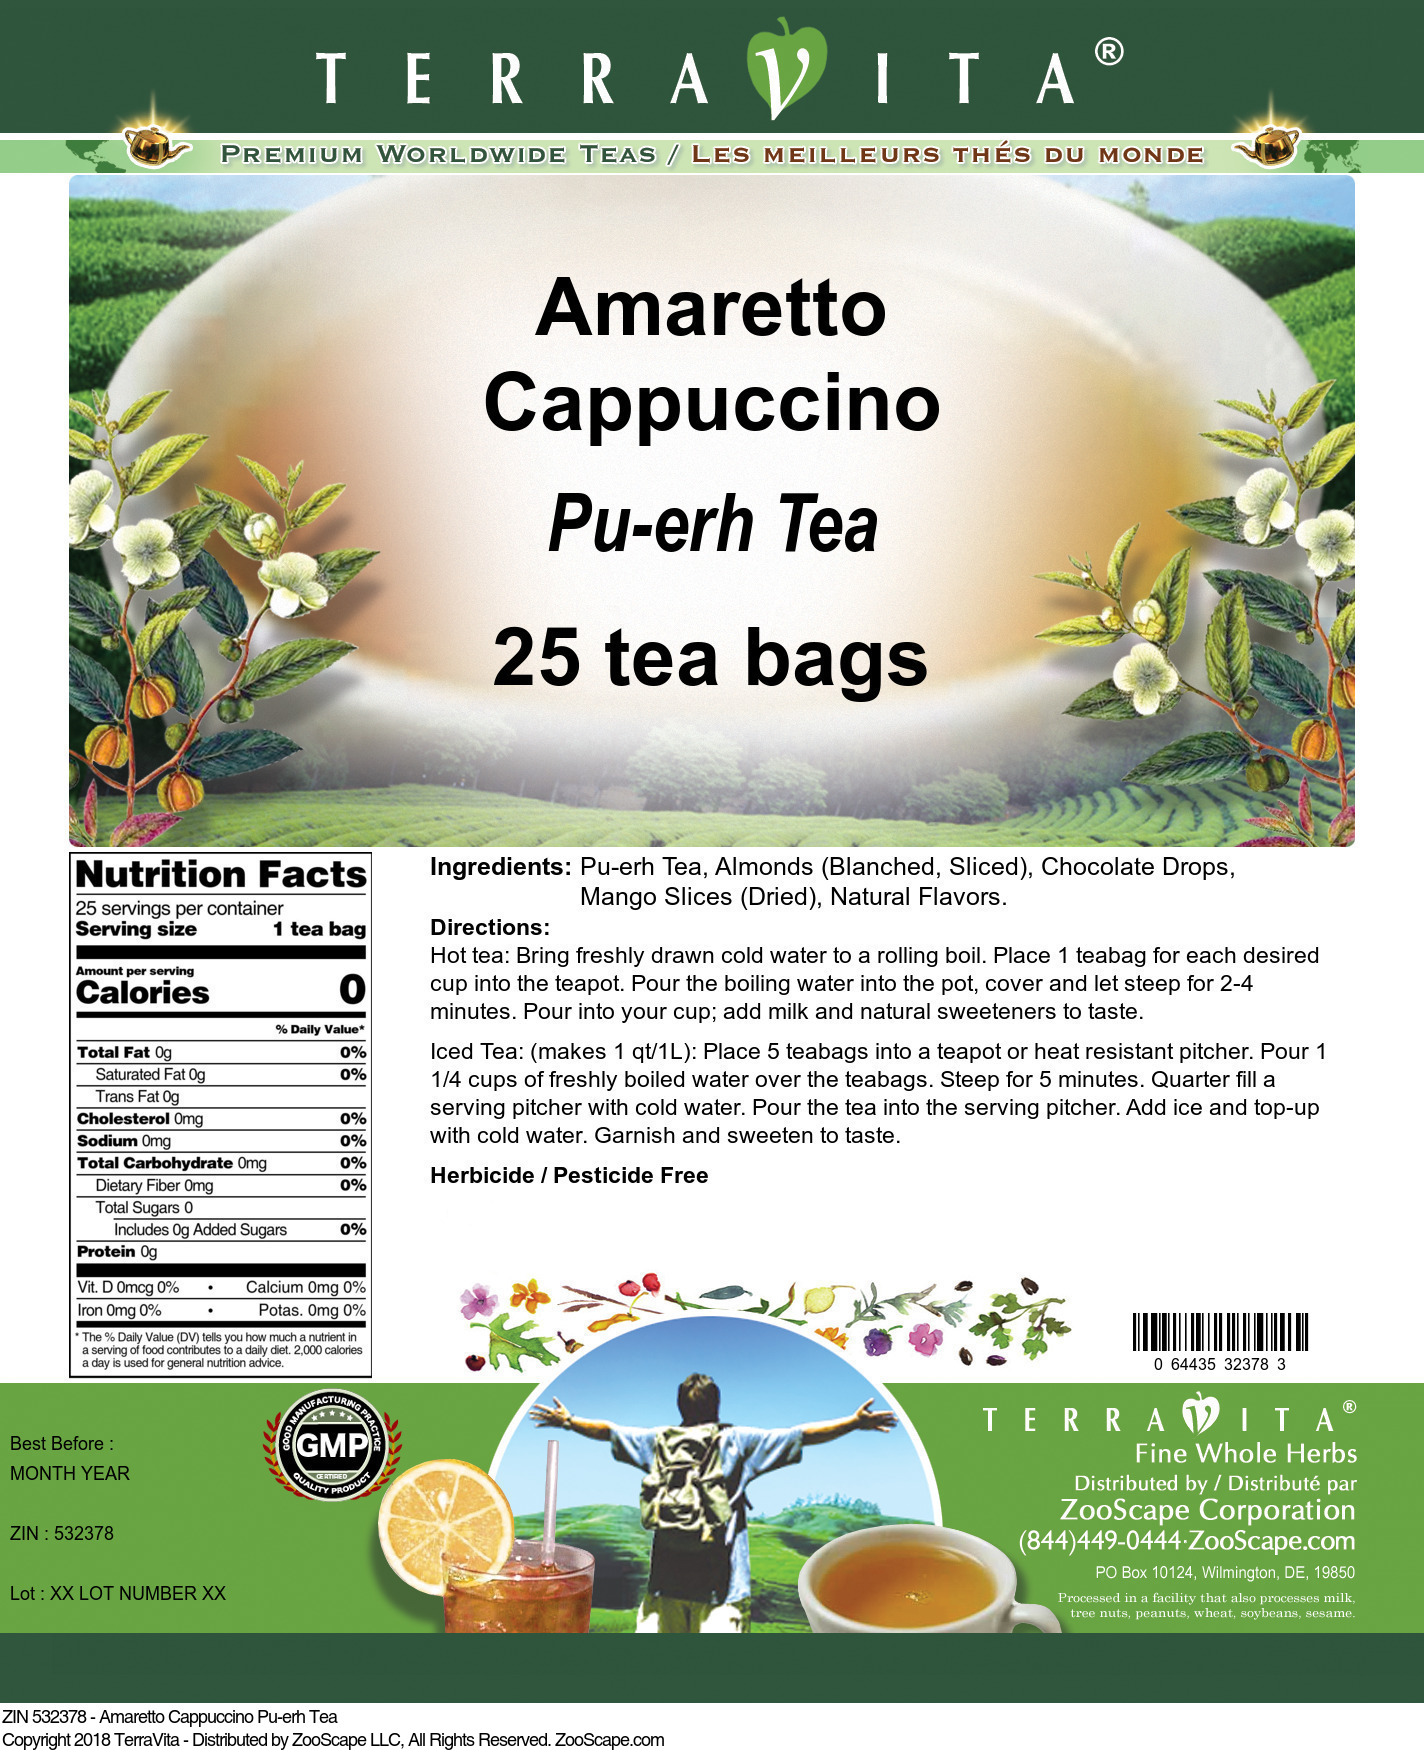 Amaretto Cappuccino Pu-erh Tea